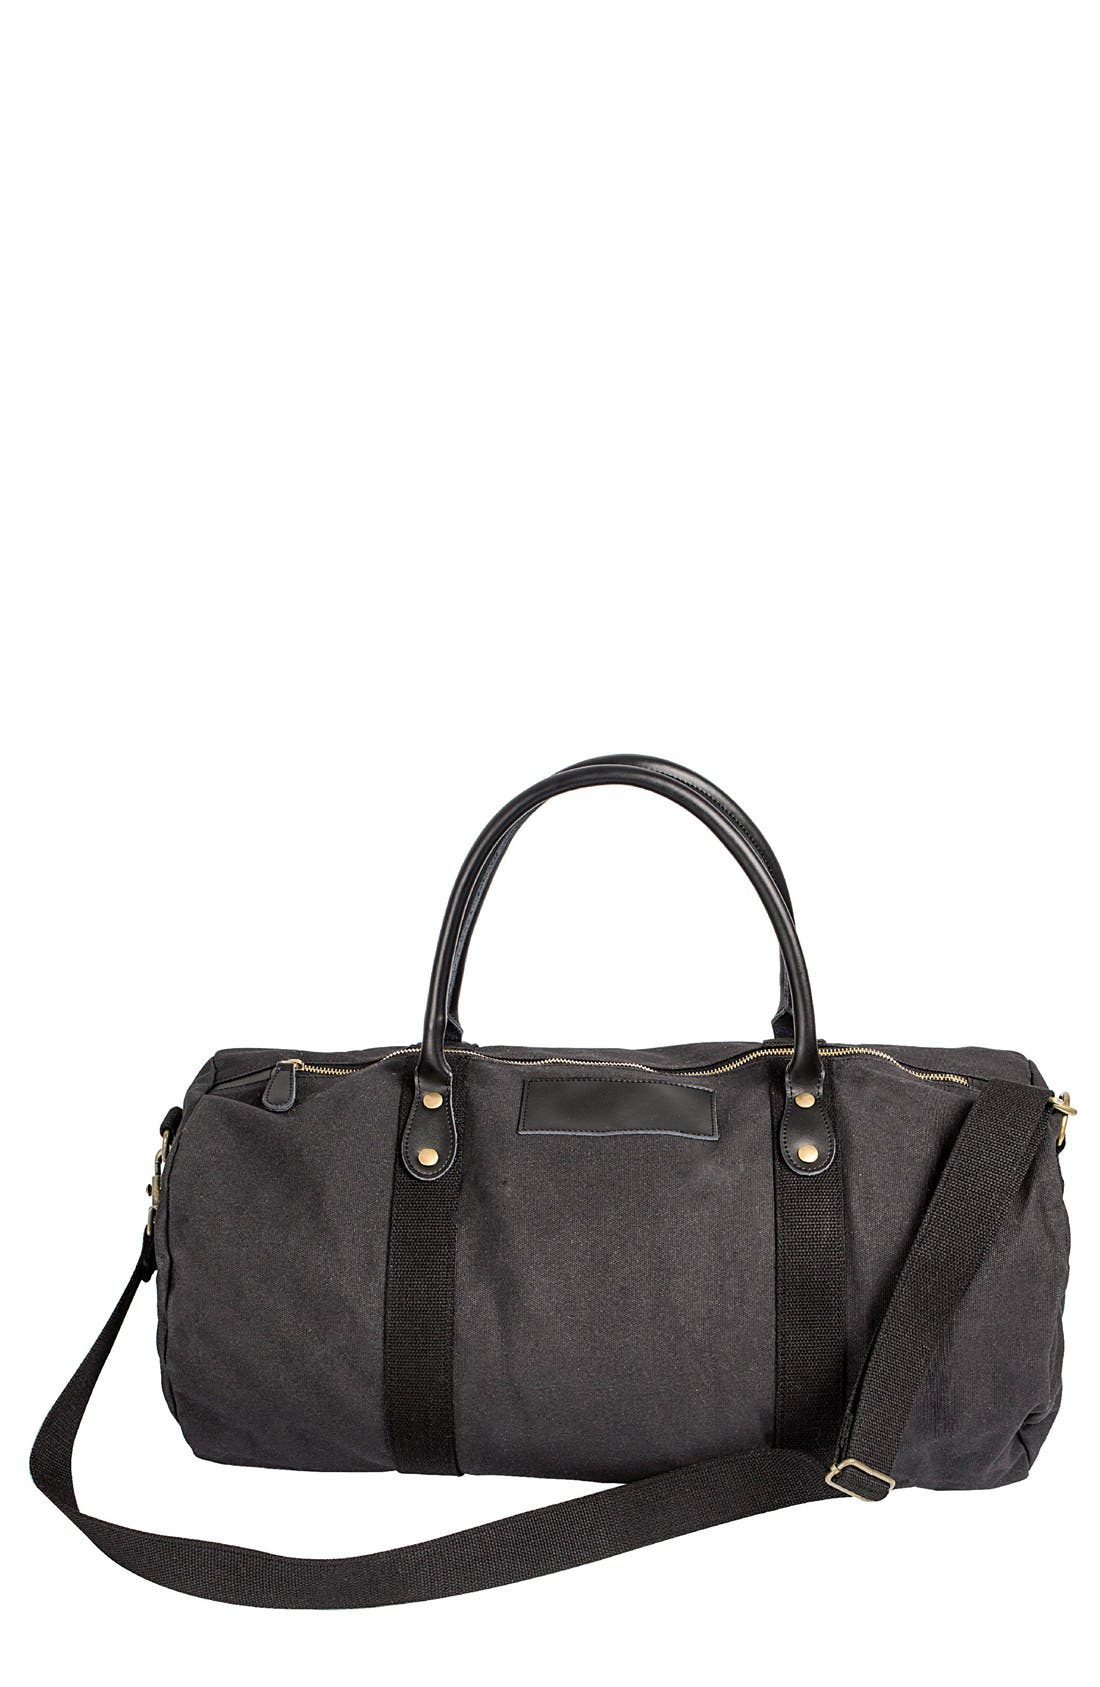 Cathy's Concepts Monogram Duffel Bag